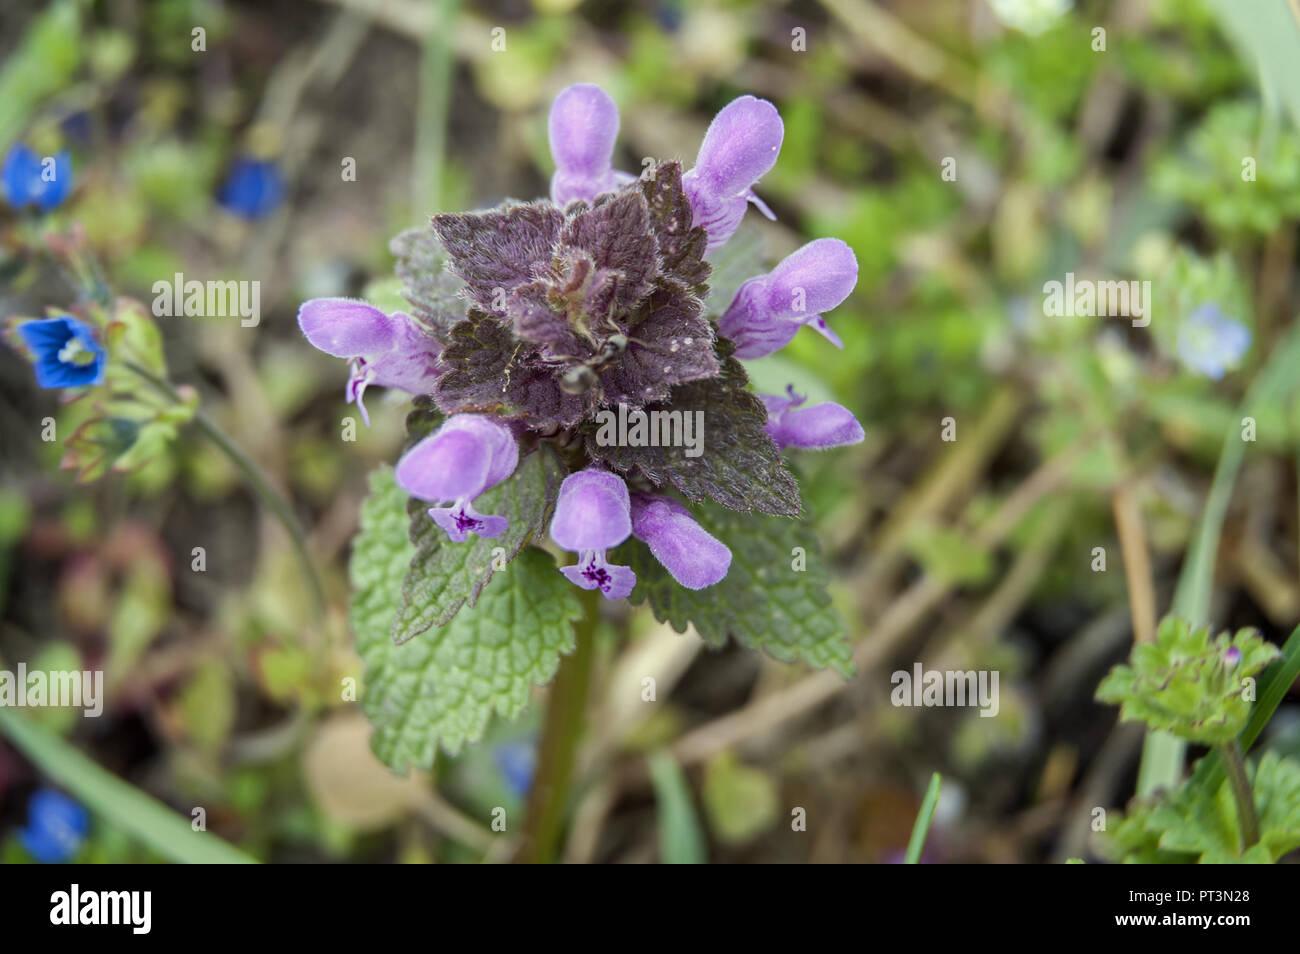 Lamium purpureum, known as red dead-nettle, purple dead-nettle, red henbit, purple archangel, or velikdenche. Jasnota purpurowa. Stock Photo